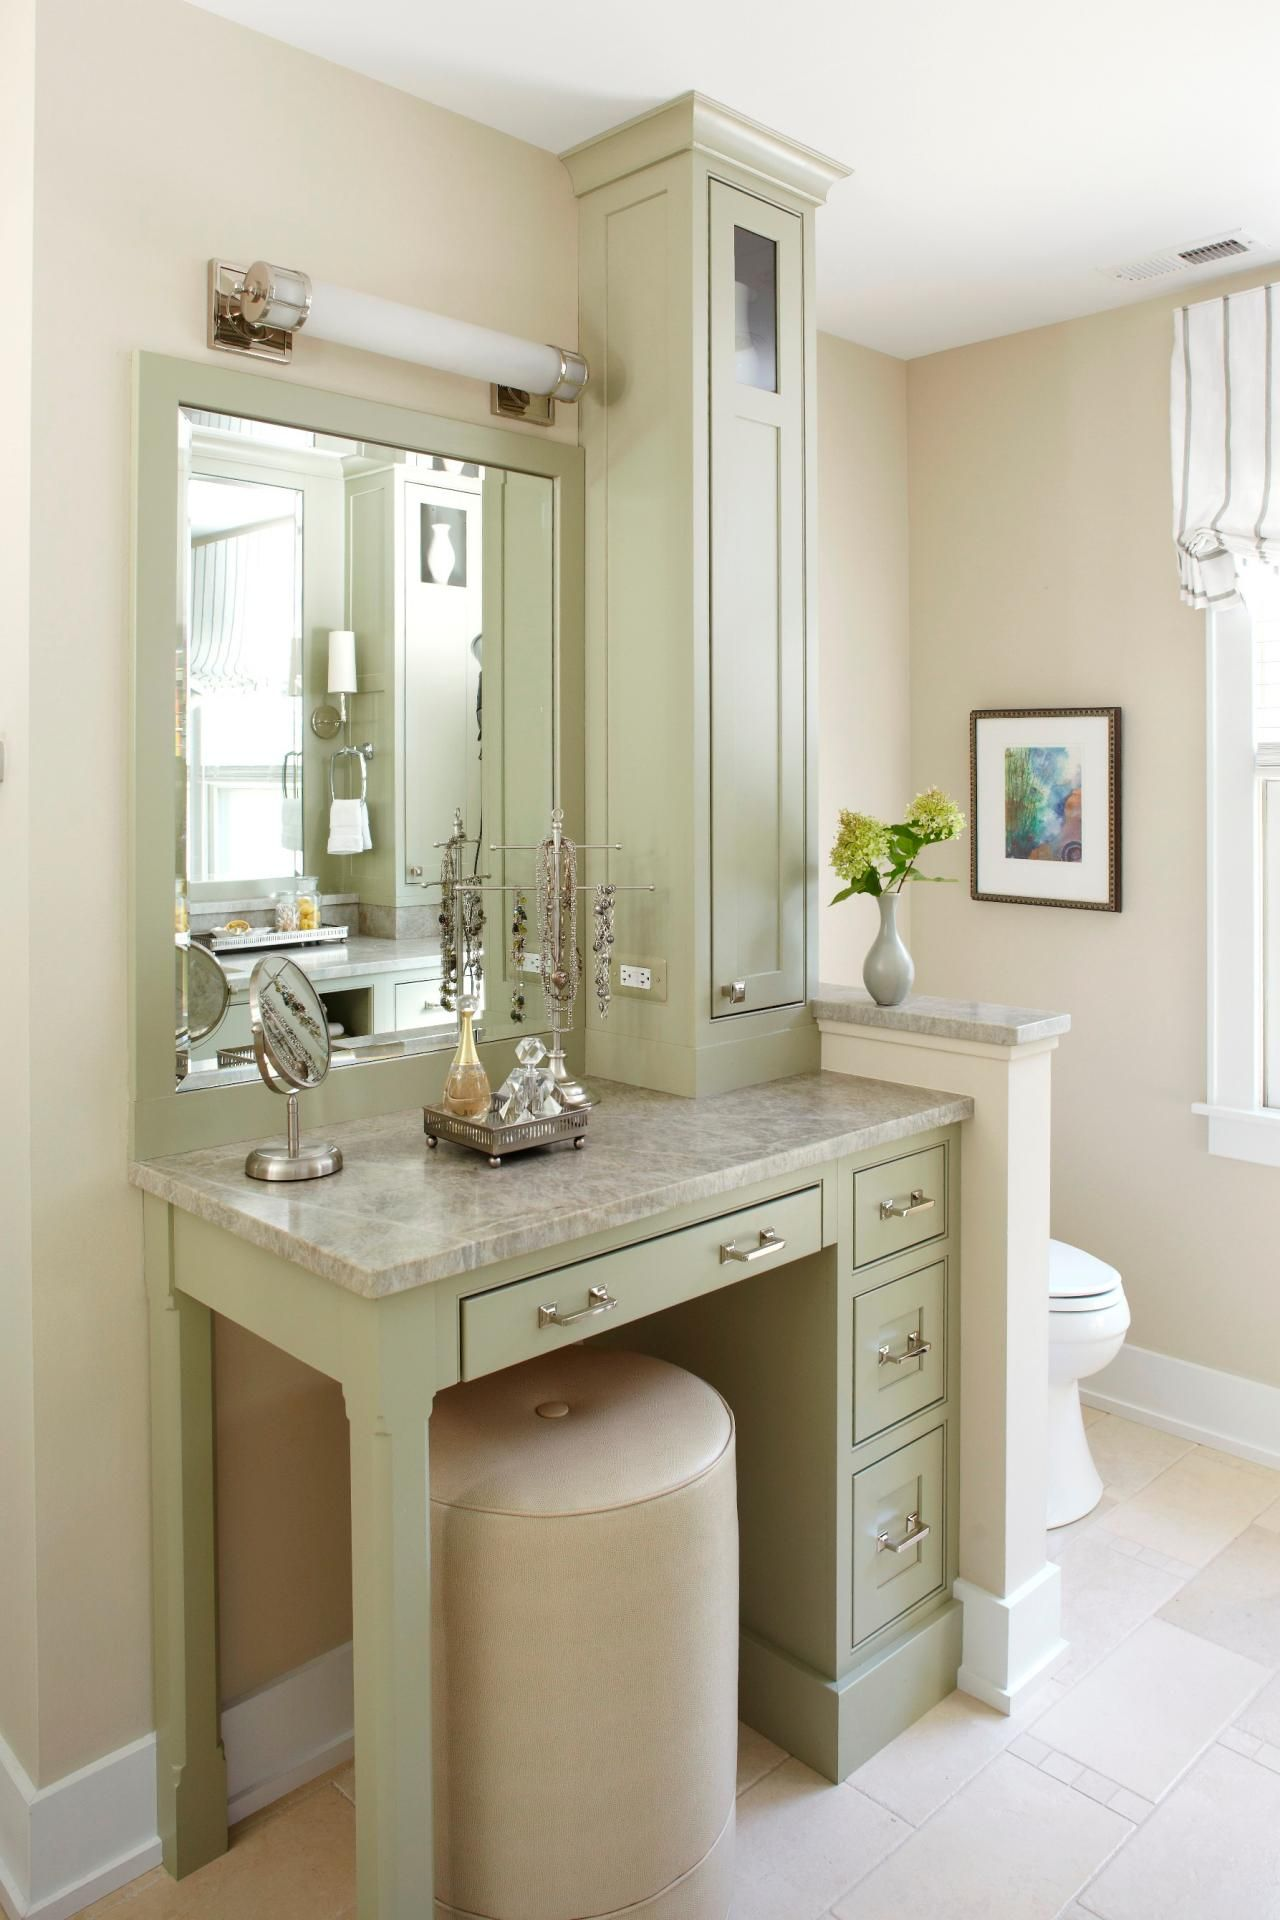 Bathroom Makeup Chair Gray And A Half Small Stylish Vanity Hgtv Design